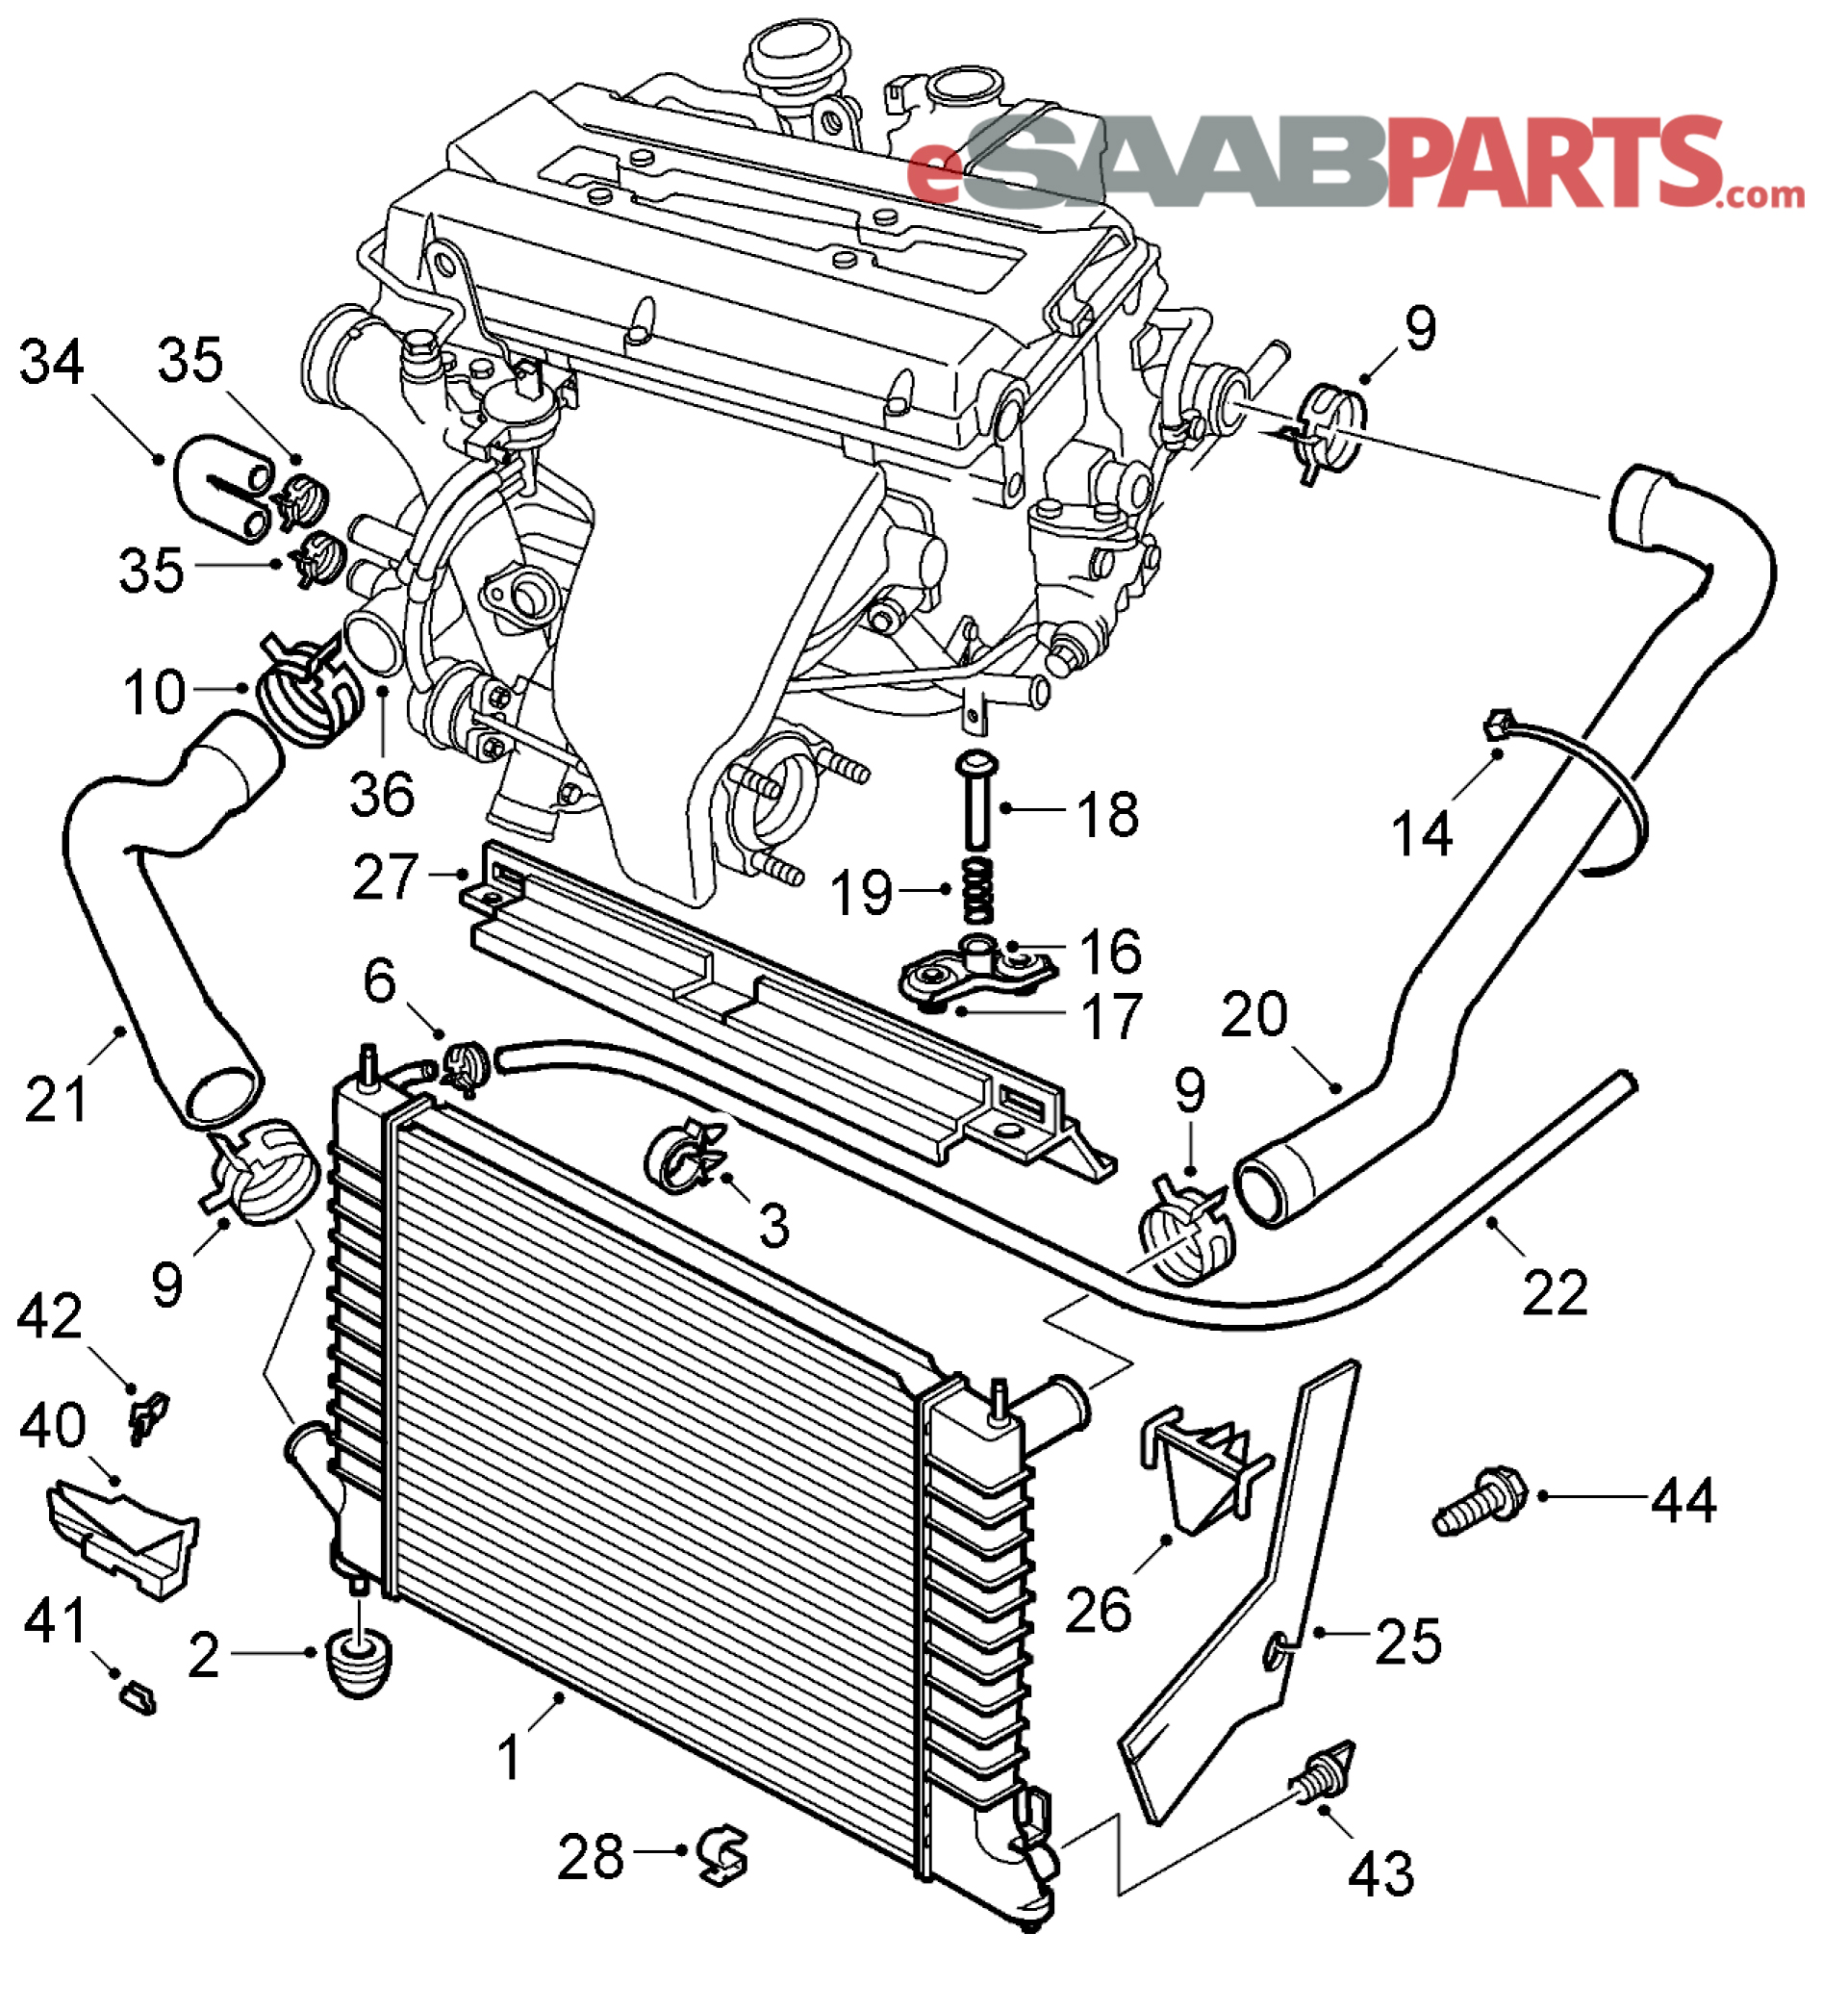 Stupendous Volvo Engine Cooling Diagram Wiring Diagram Wiring Cloud Picalendutblikvittorg